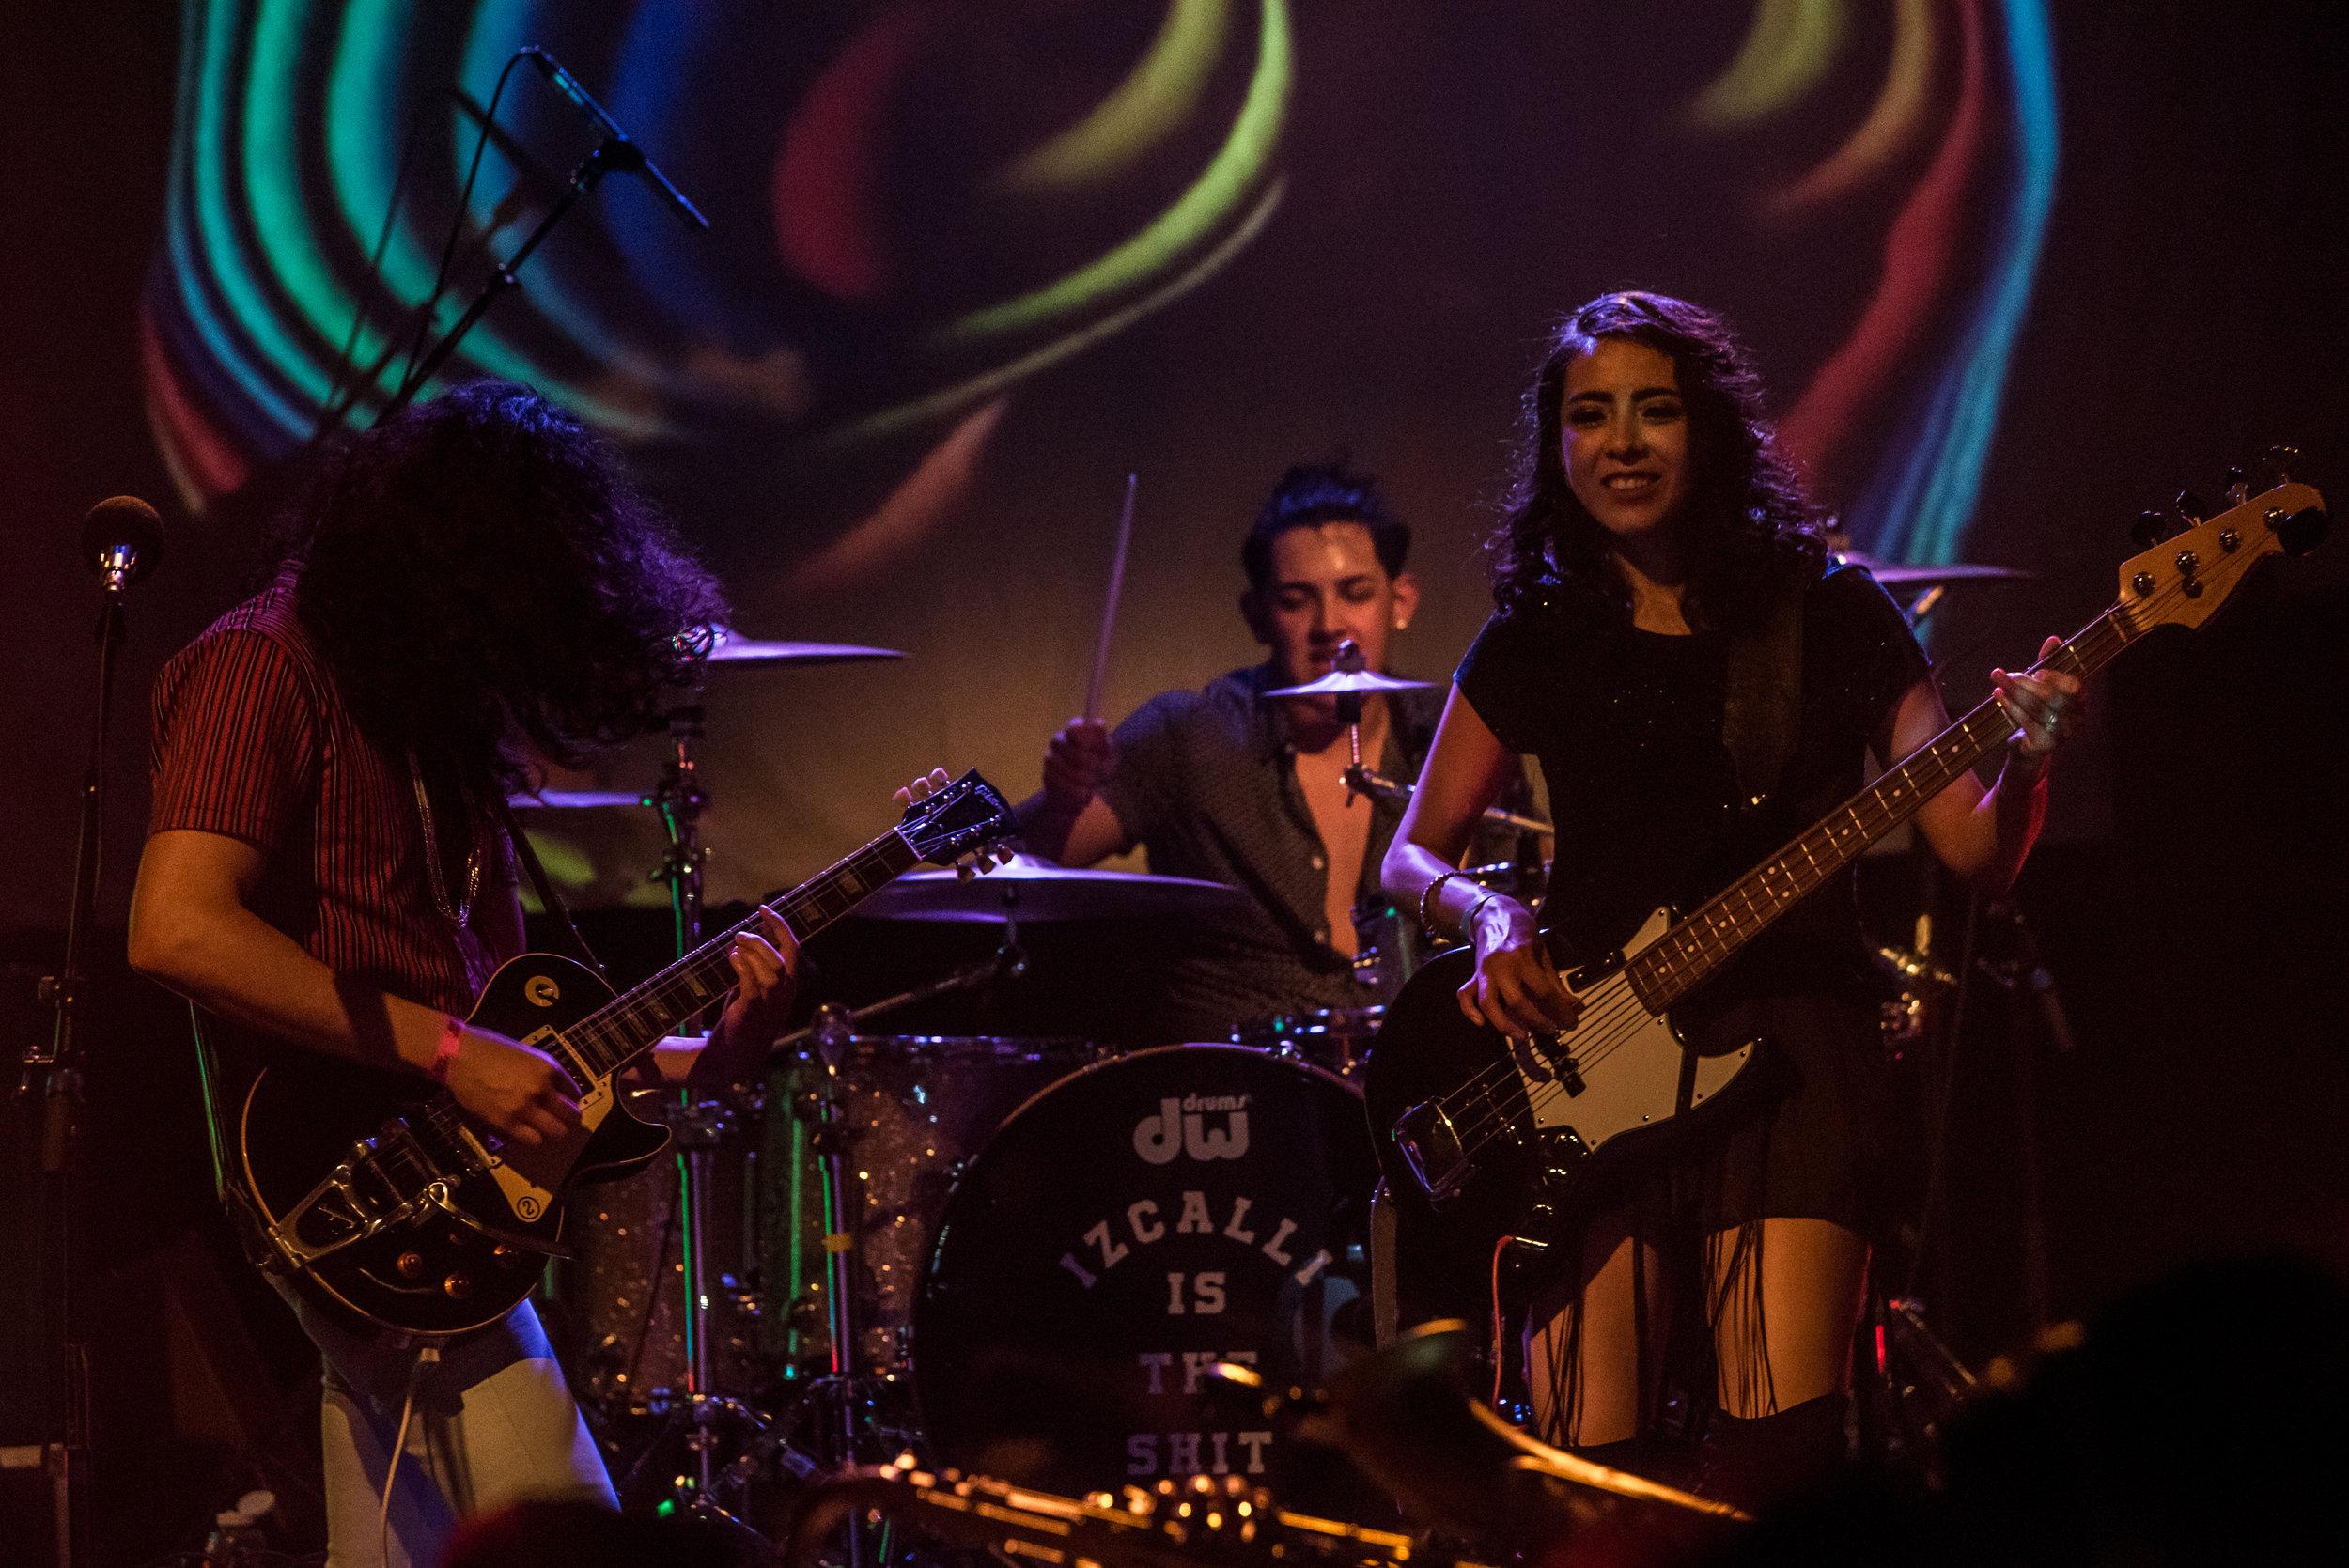 iZCALLi_Rock de Mayo-18.jpg